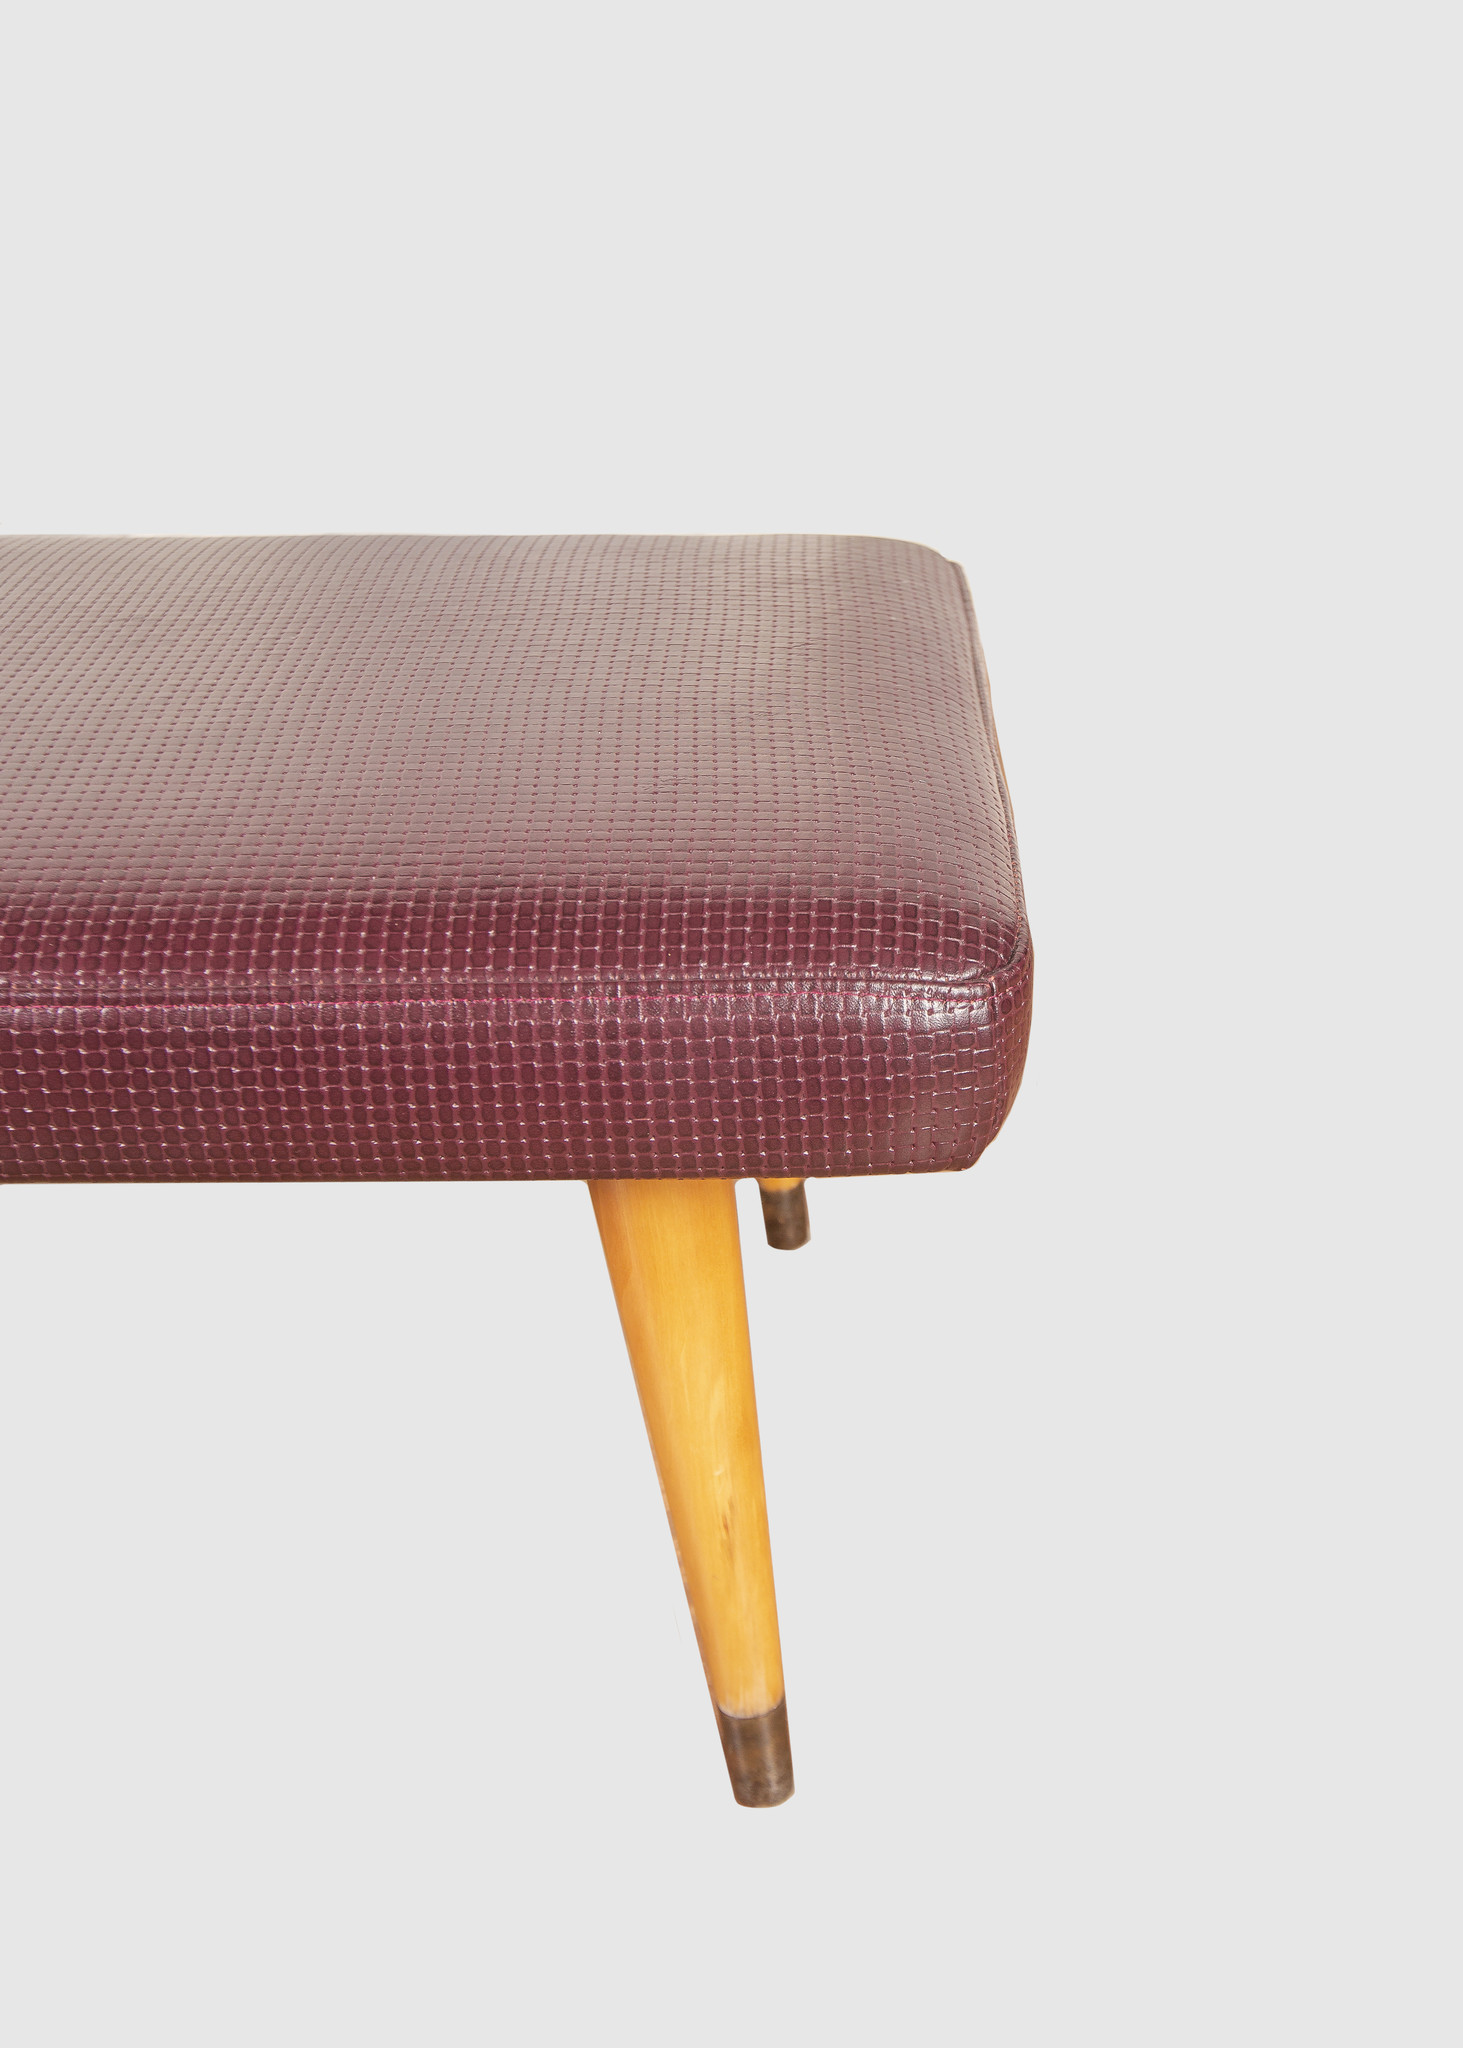 Fantastic Eskell Woven Leather Ottoman Lamtechconsult Wood Chair Design Ideas Lamtechconsultcom